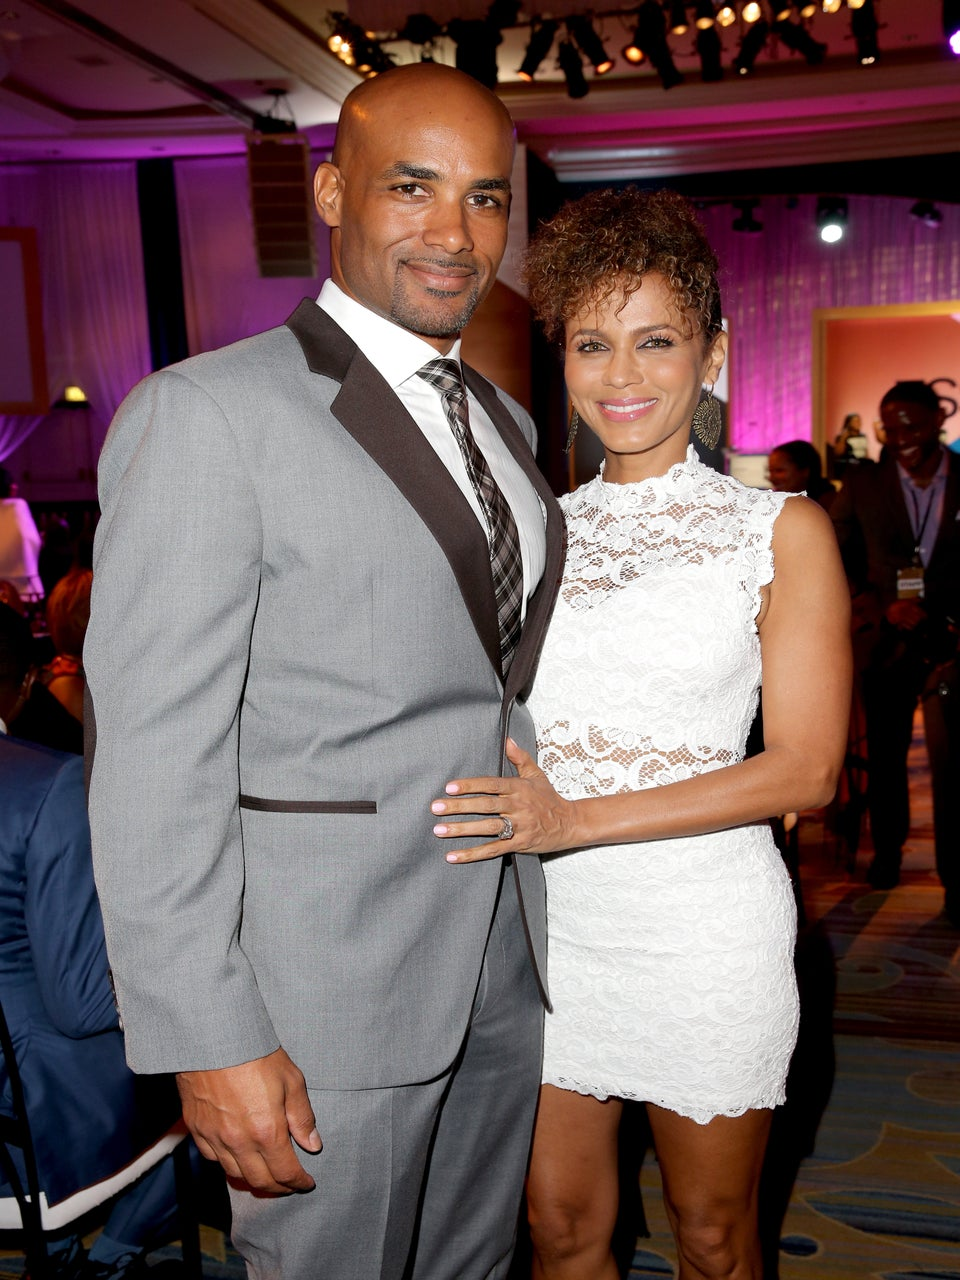 Guess What's Next On Boris Kodjoe And Nicole Ari Parker's Marriage Bucket List